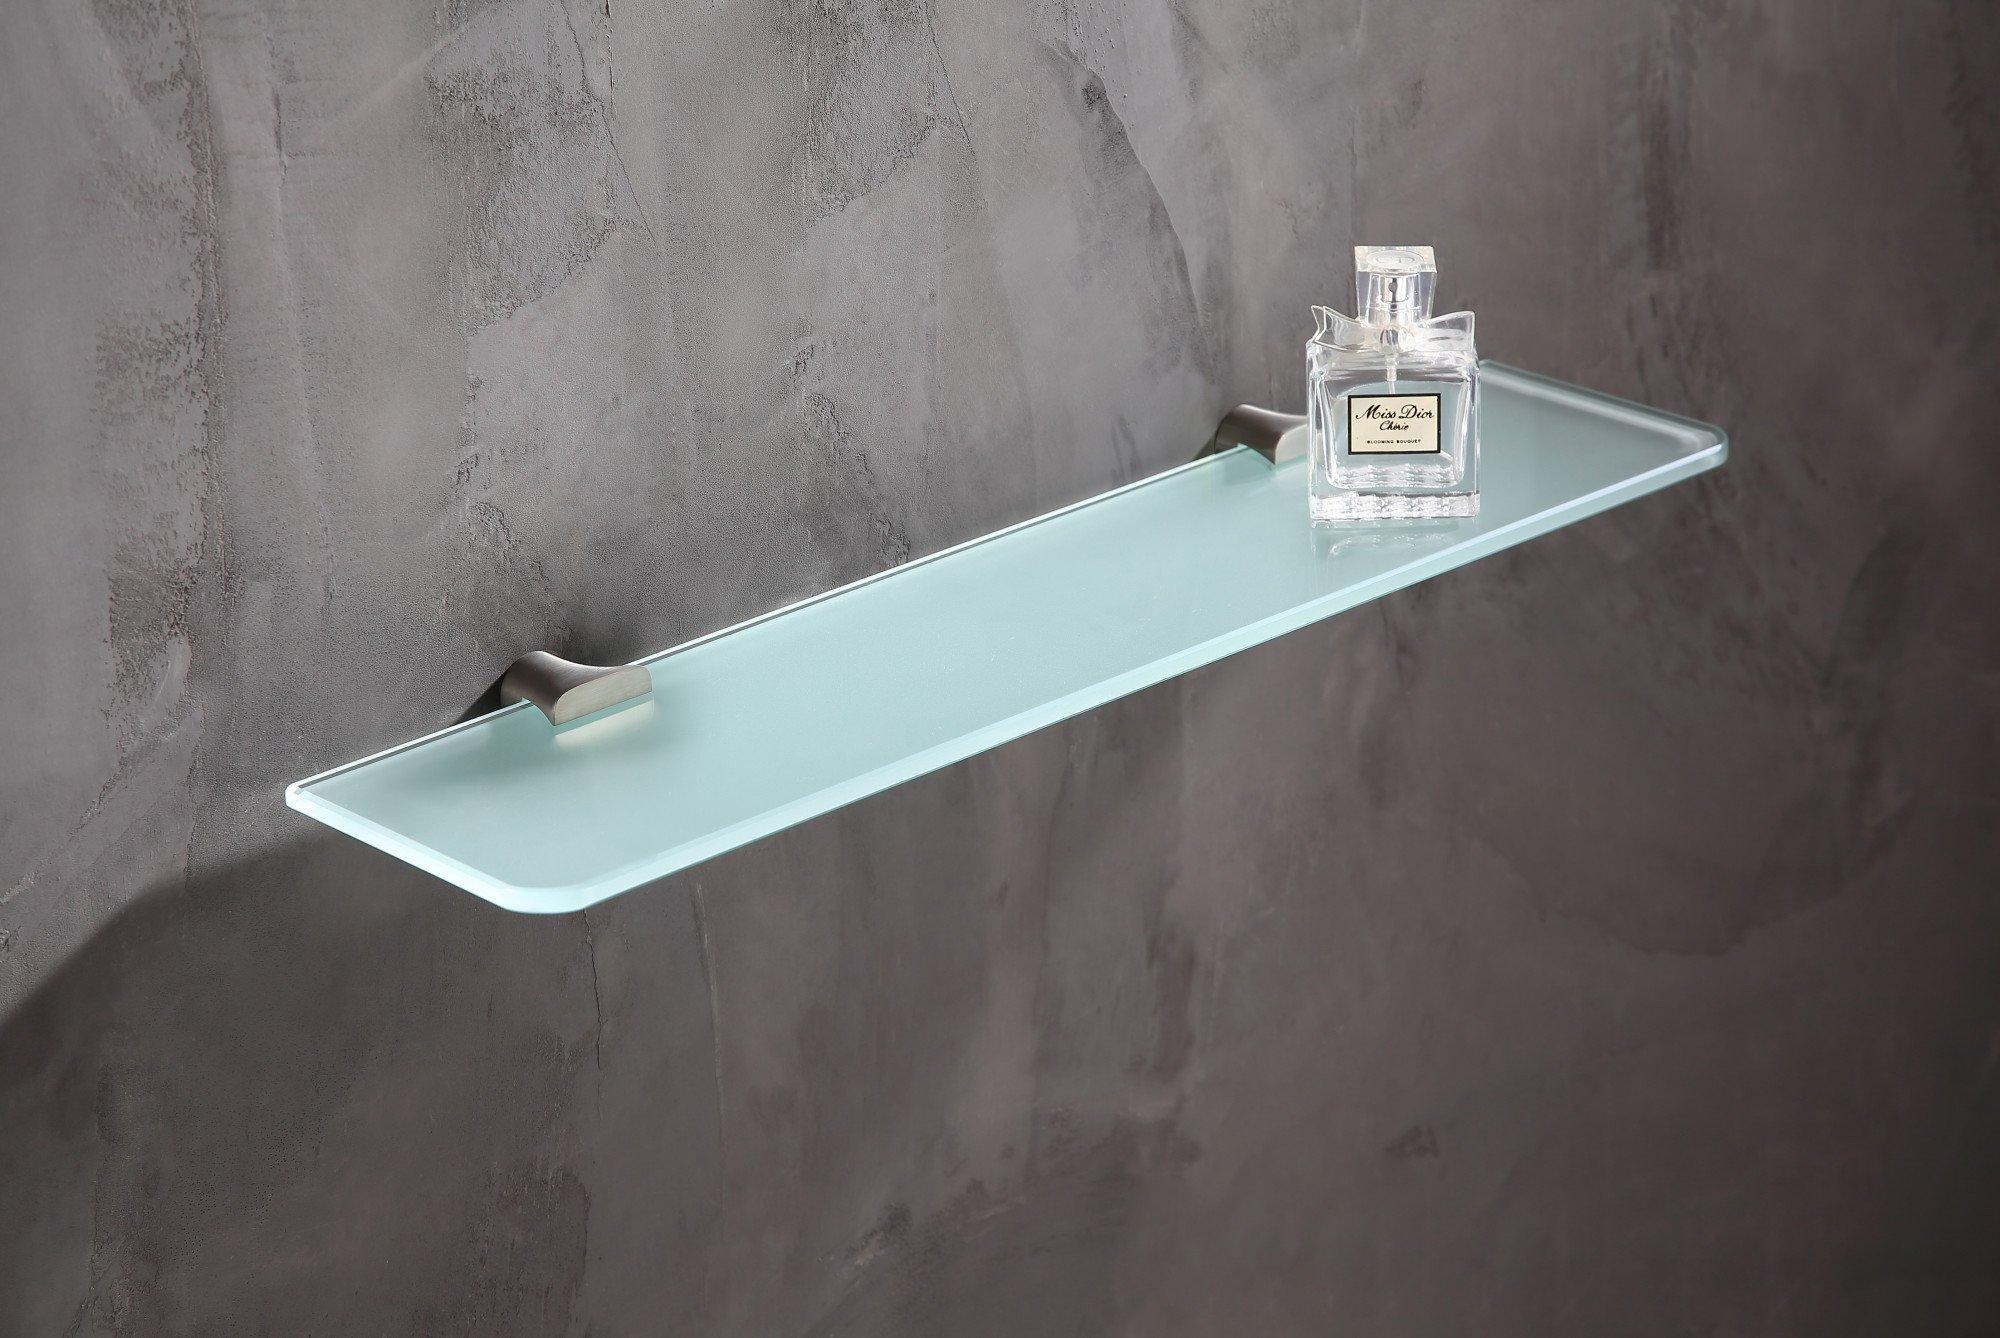 19.69'' Glass Shelf - Brushed Nickel - Essence Series AC-AZ050BN - ANZZI by ANZZI (Image #3)